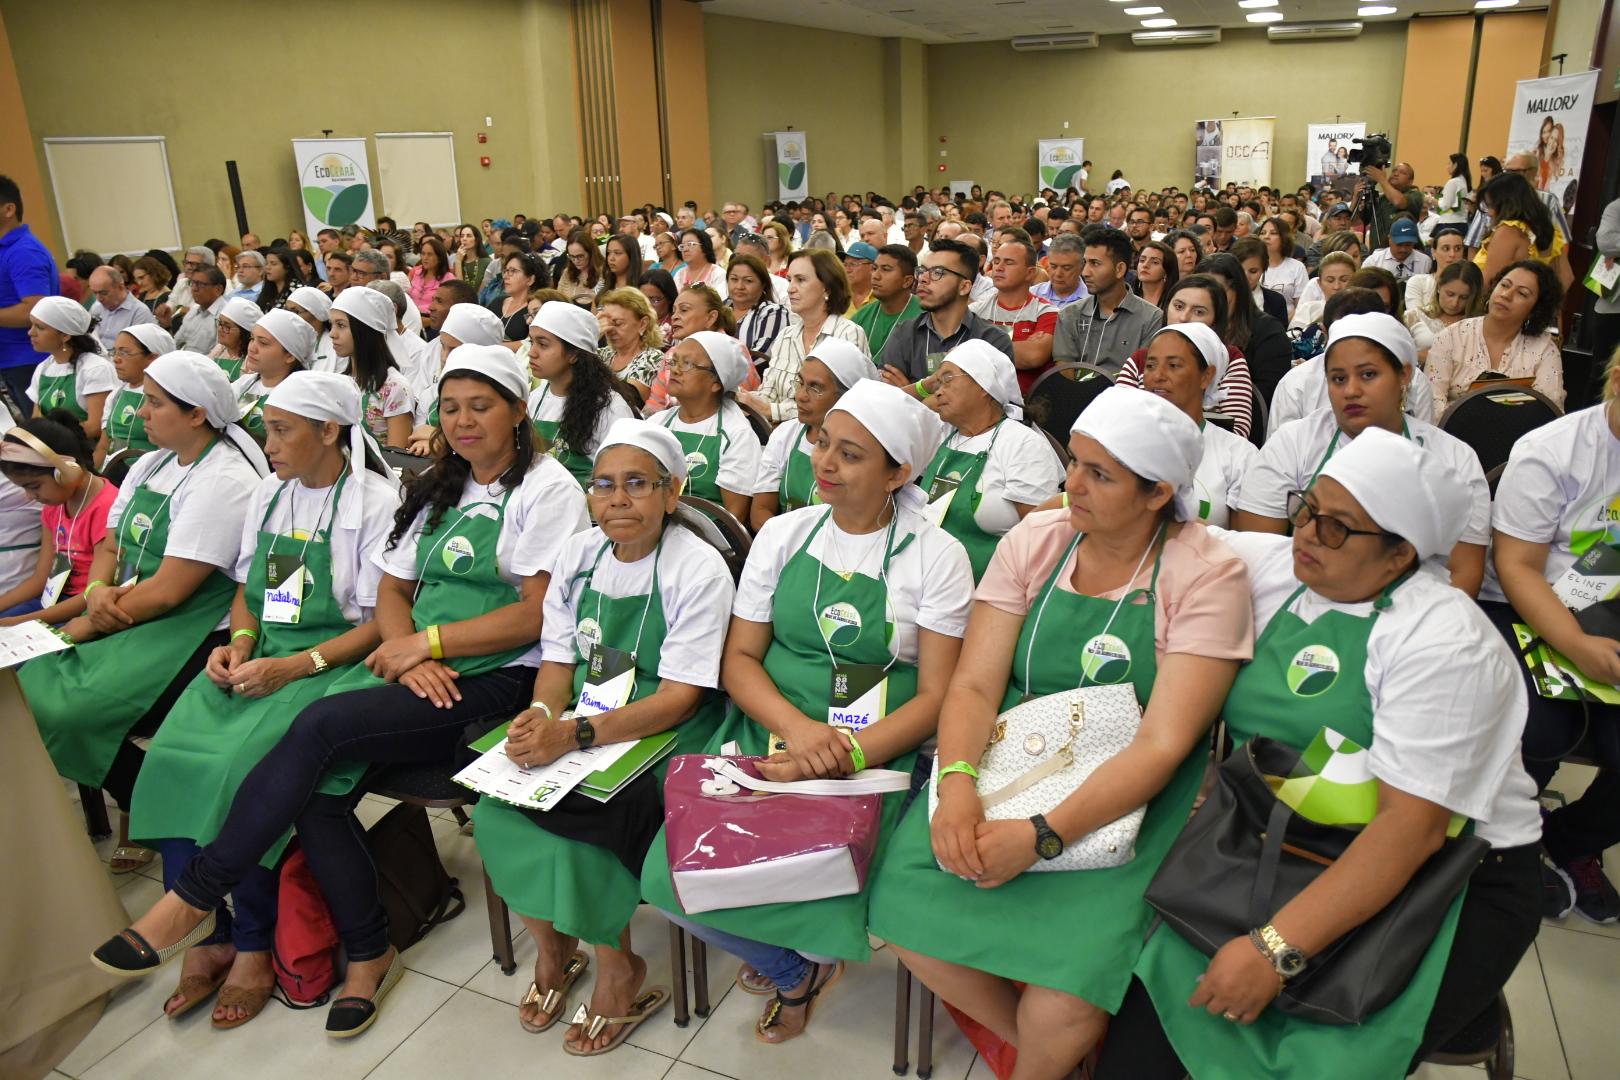 Festival Internacional de Gastronomia Orgânica